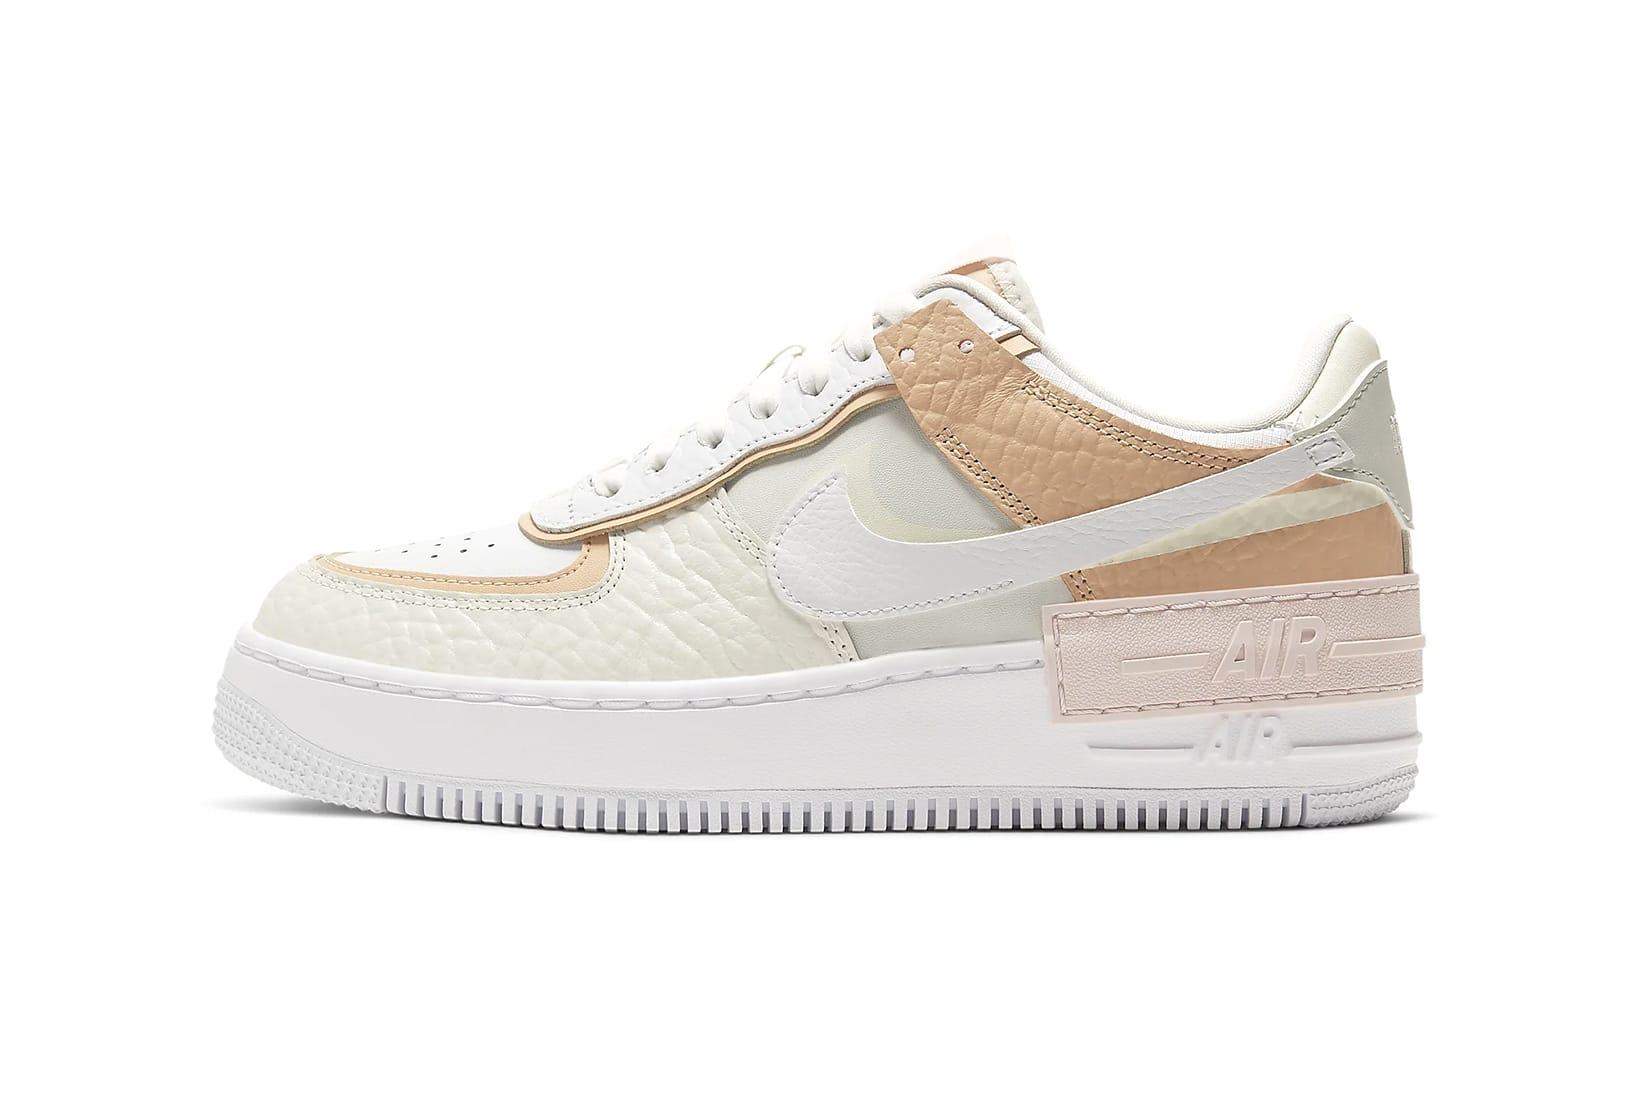 Nike Air Force 1 Shadow in \